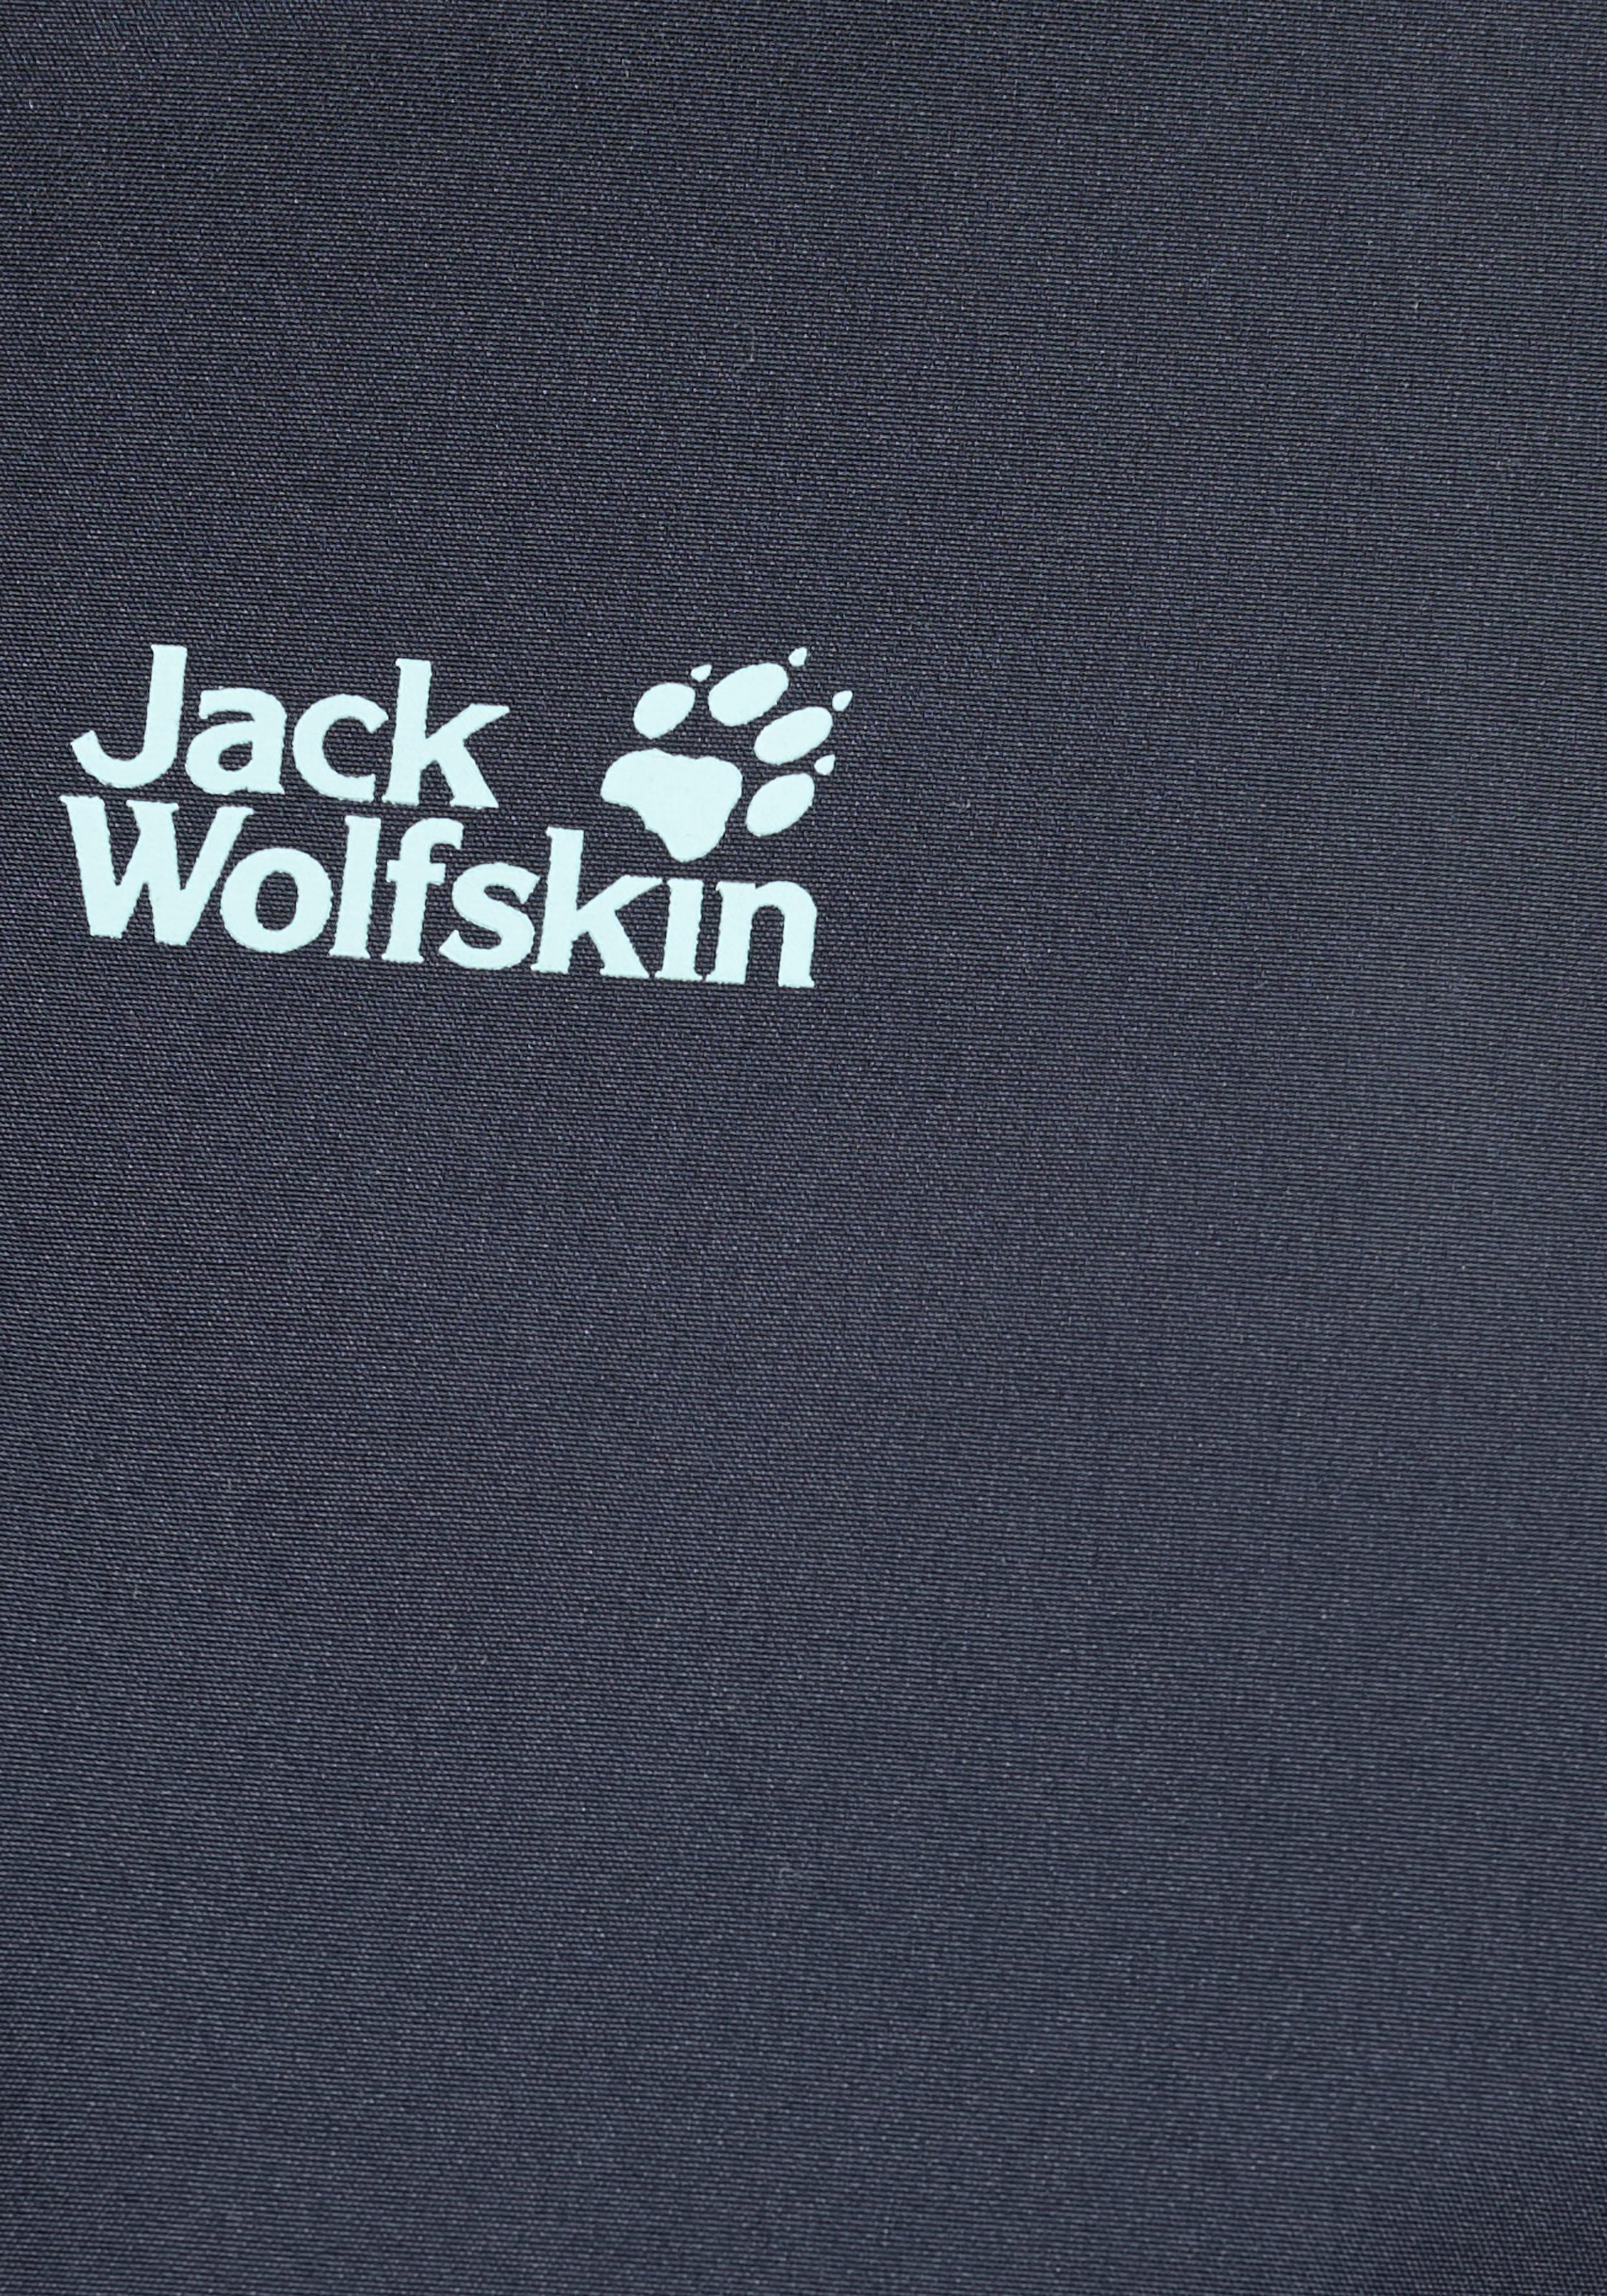 jack wolfskin funktionsjacke stormy river Funktionsjacke von Jack Wolfskin AKLBB710585687